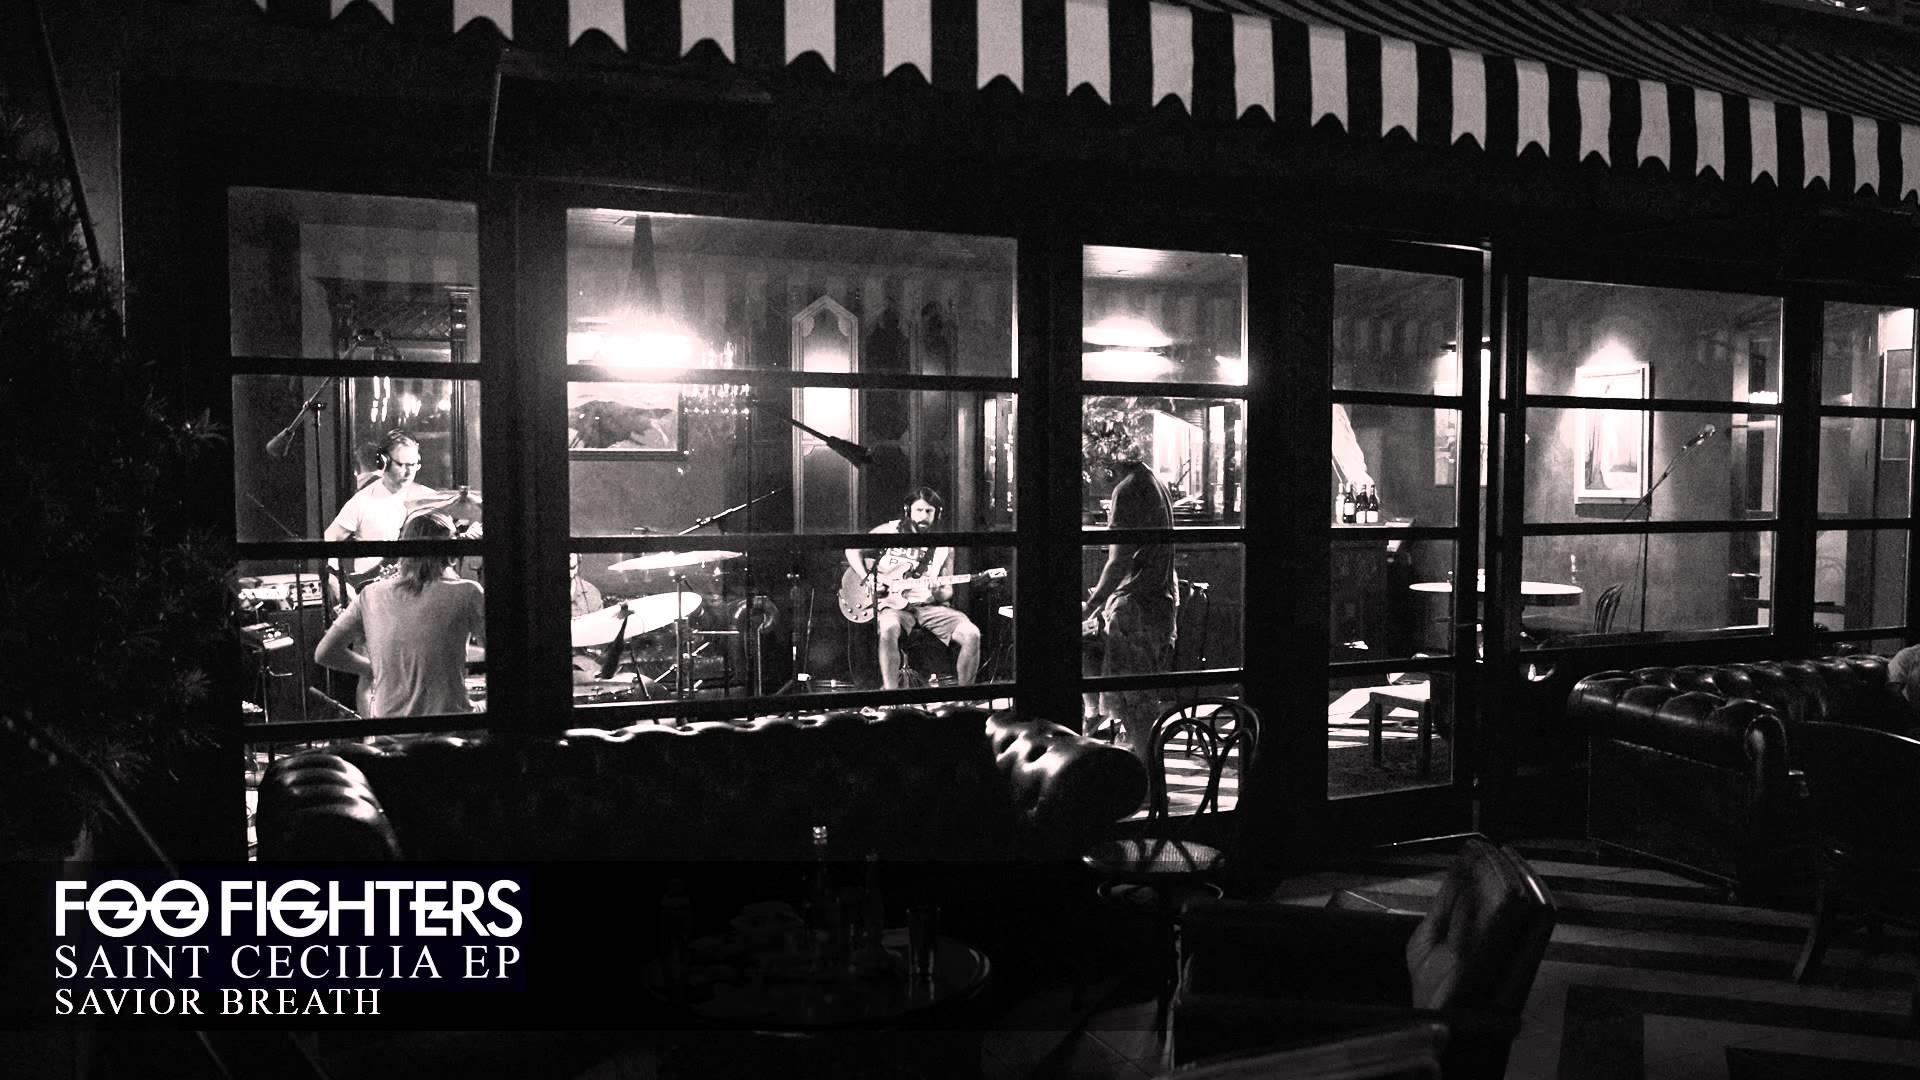 Foo Fighters - Savior Breath